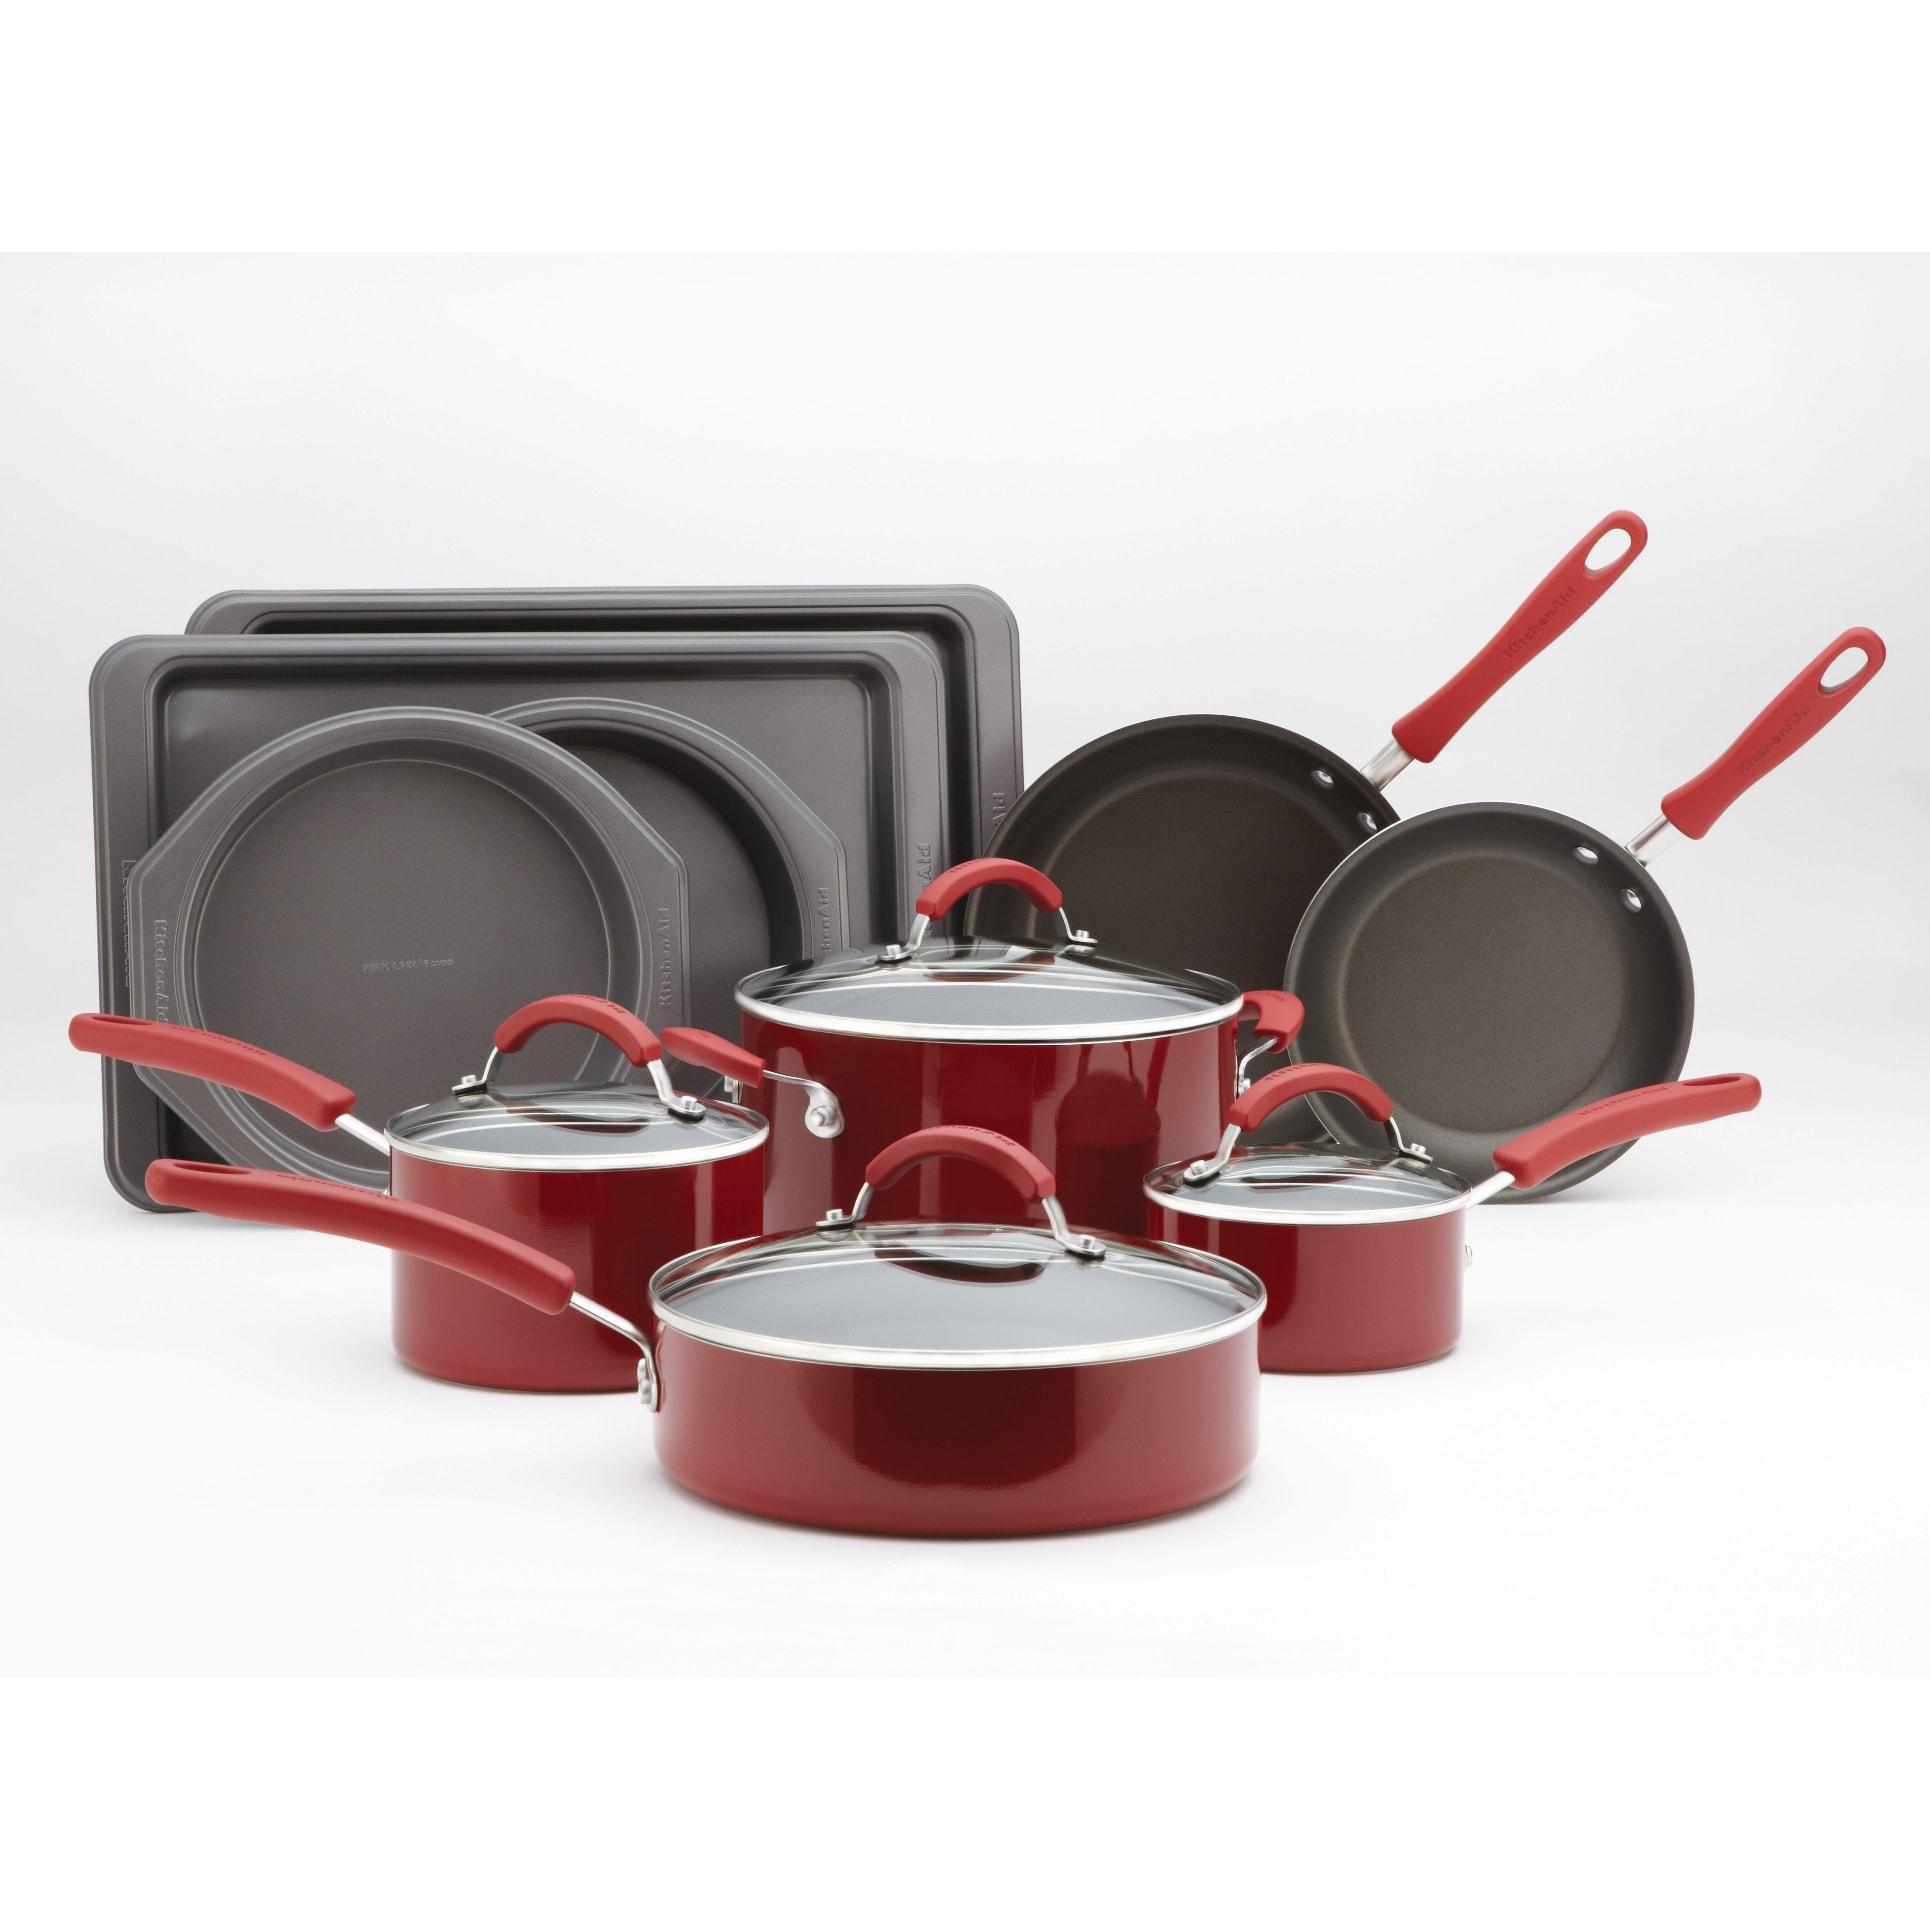 Aluminum 14 Piece Cookware Set